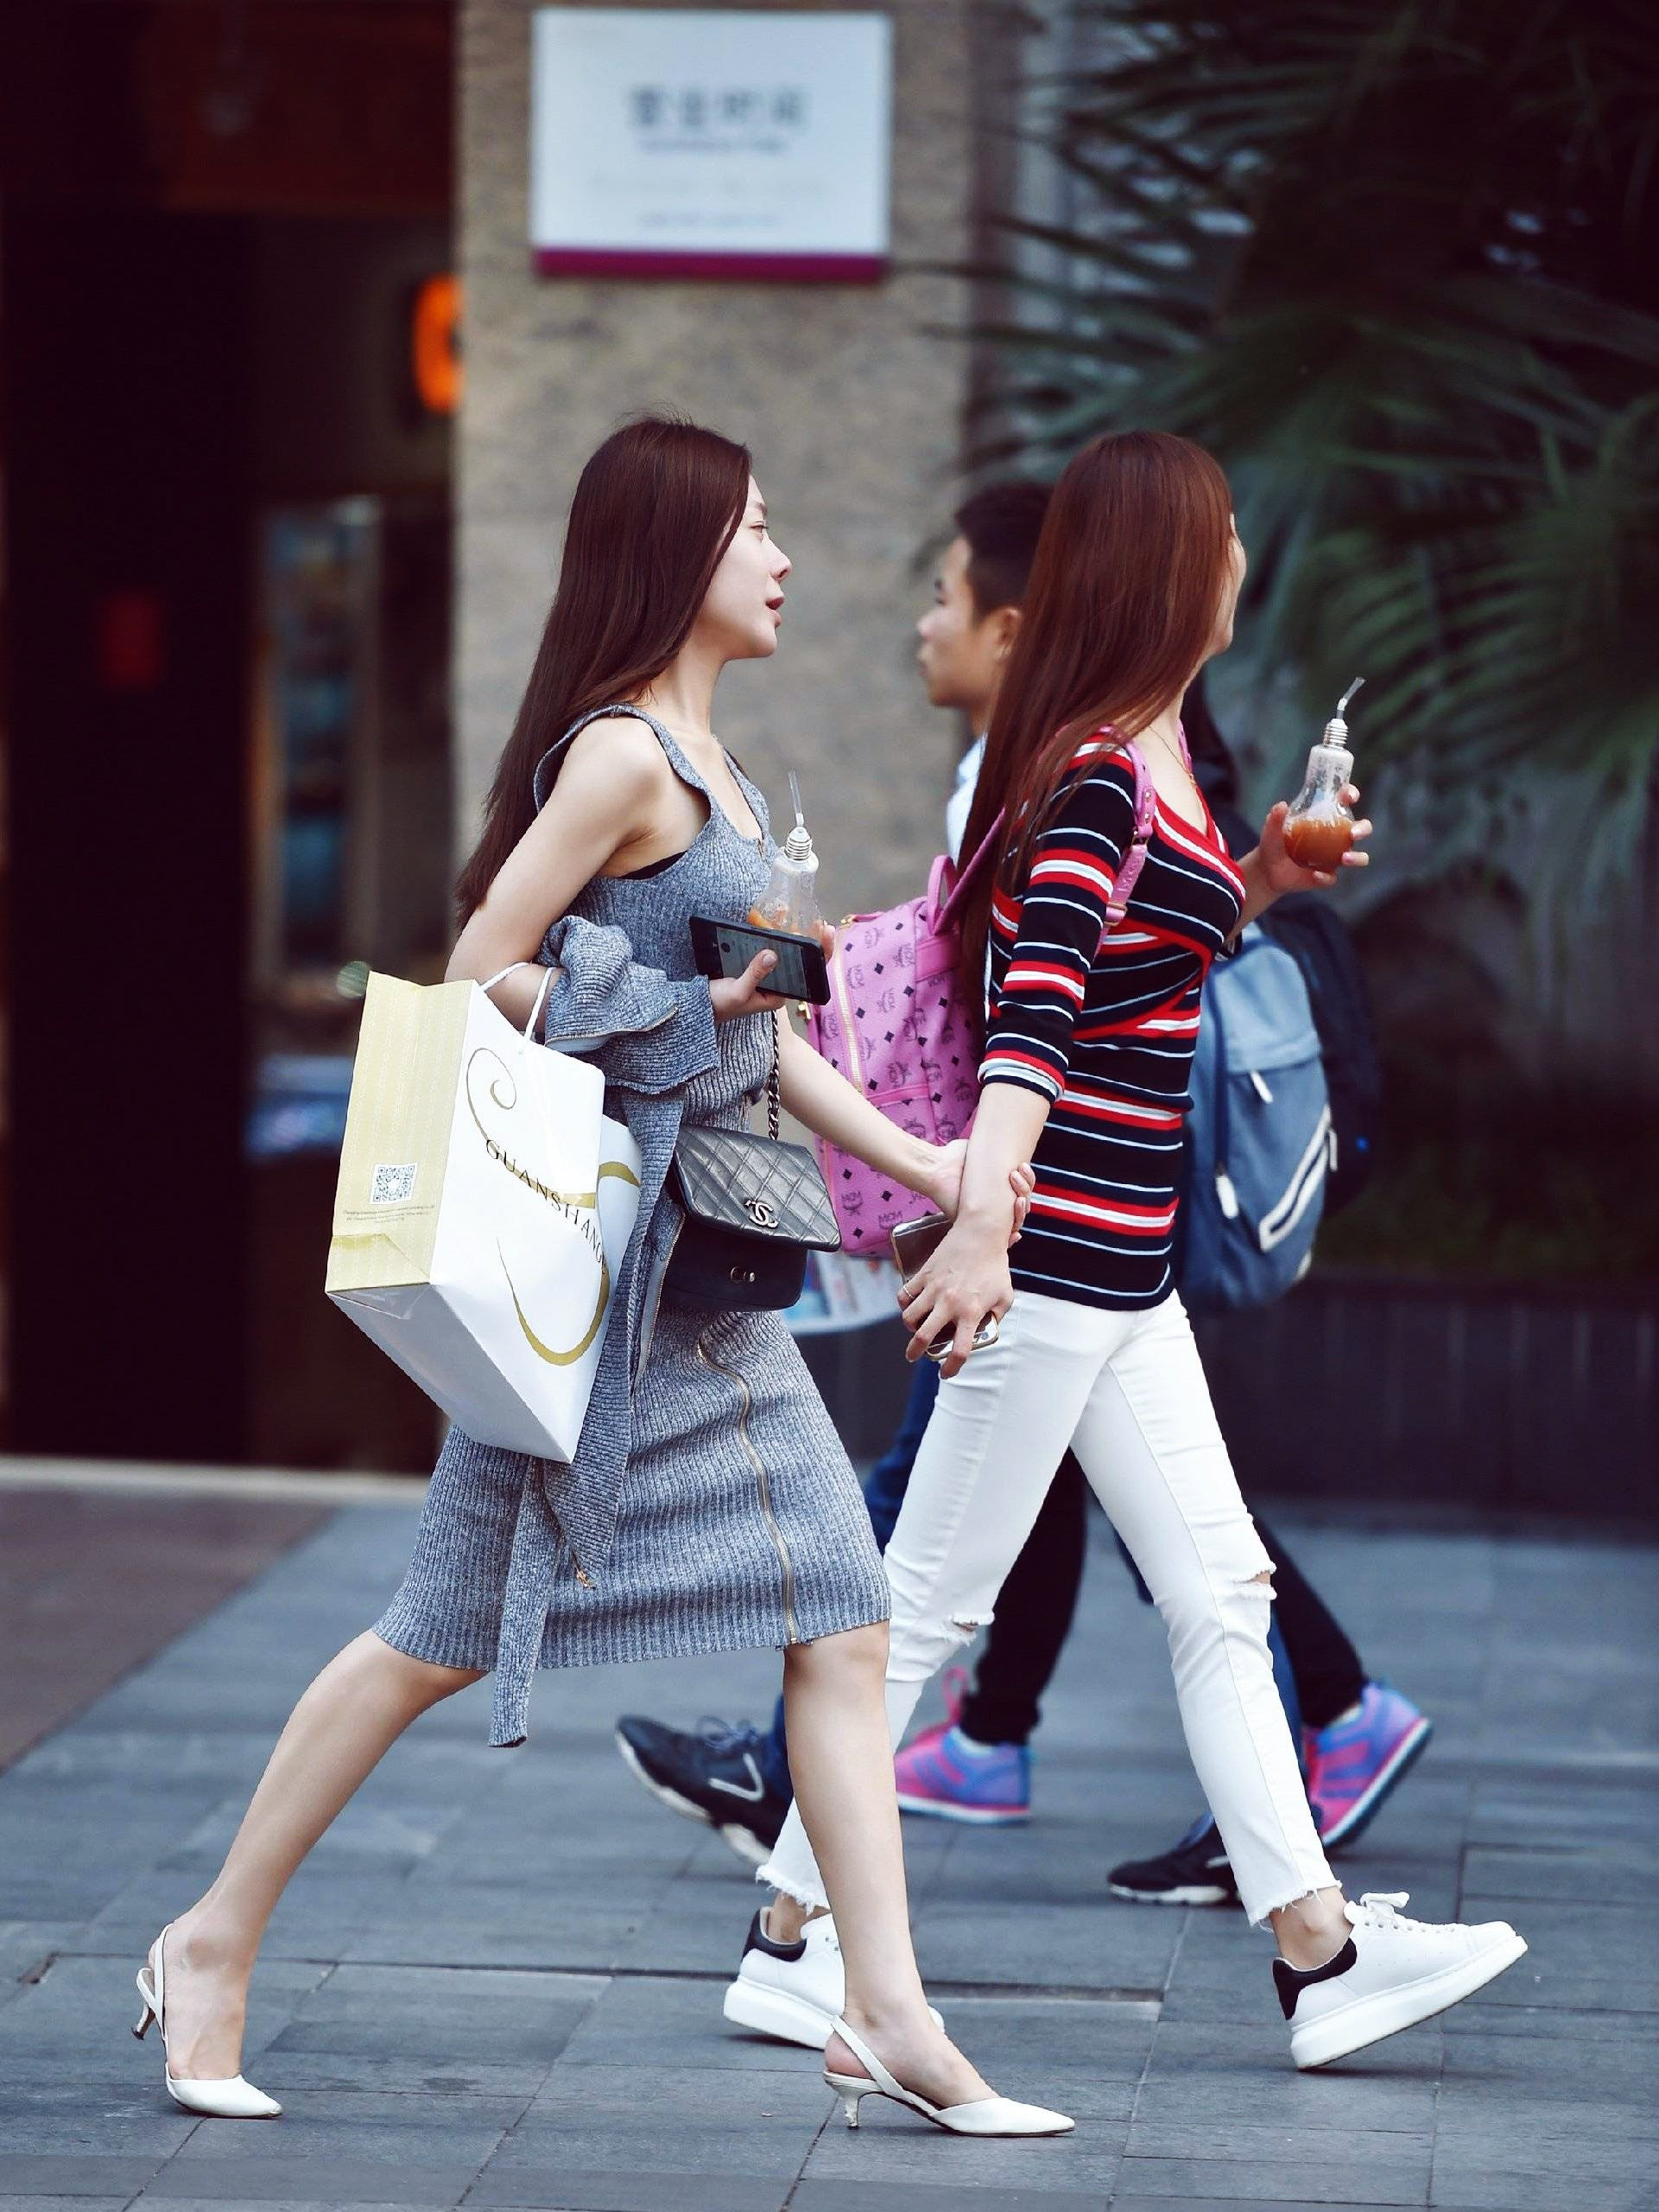 adolescent, asian girl, beauty